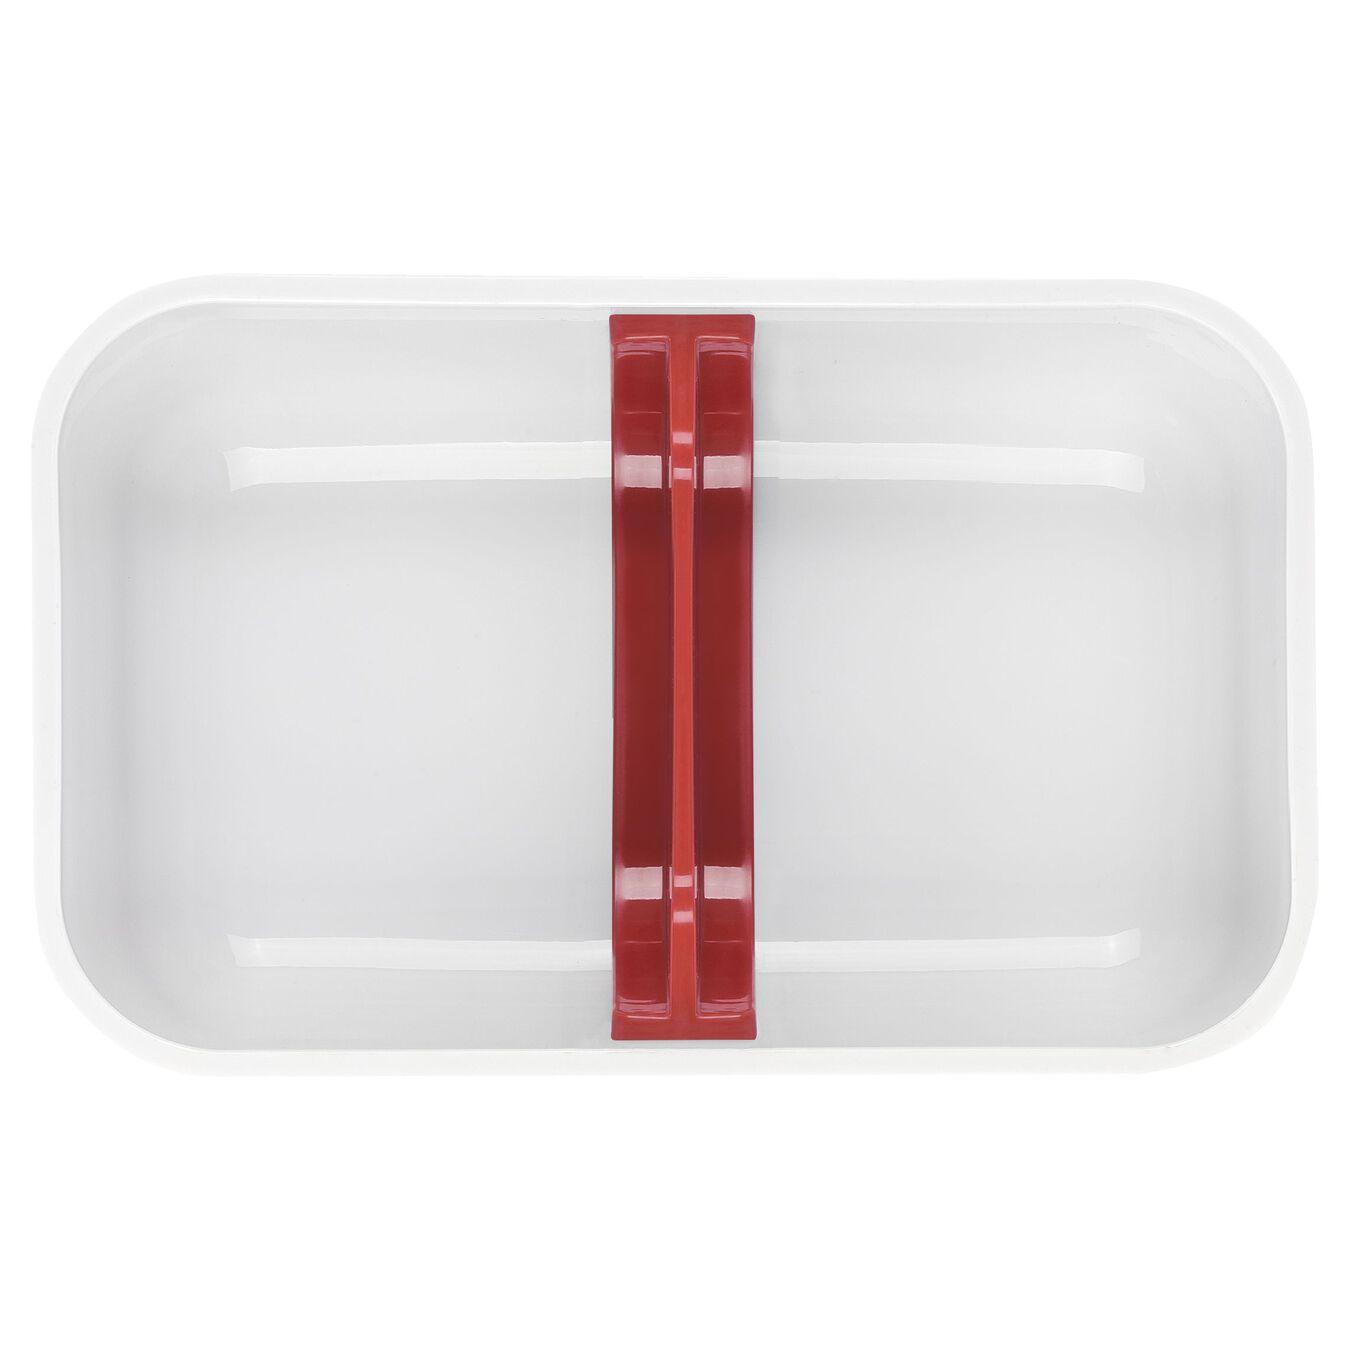 Vakuum Lunchbox, M, Kunststoff, Weiß-Rot,,large 4